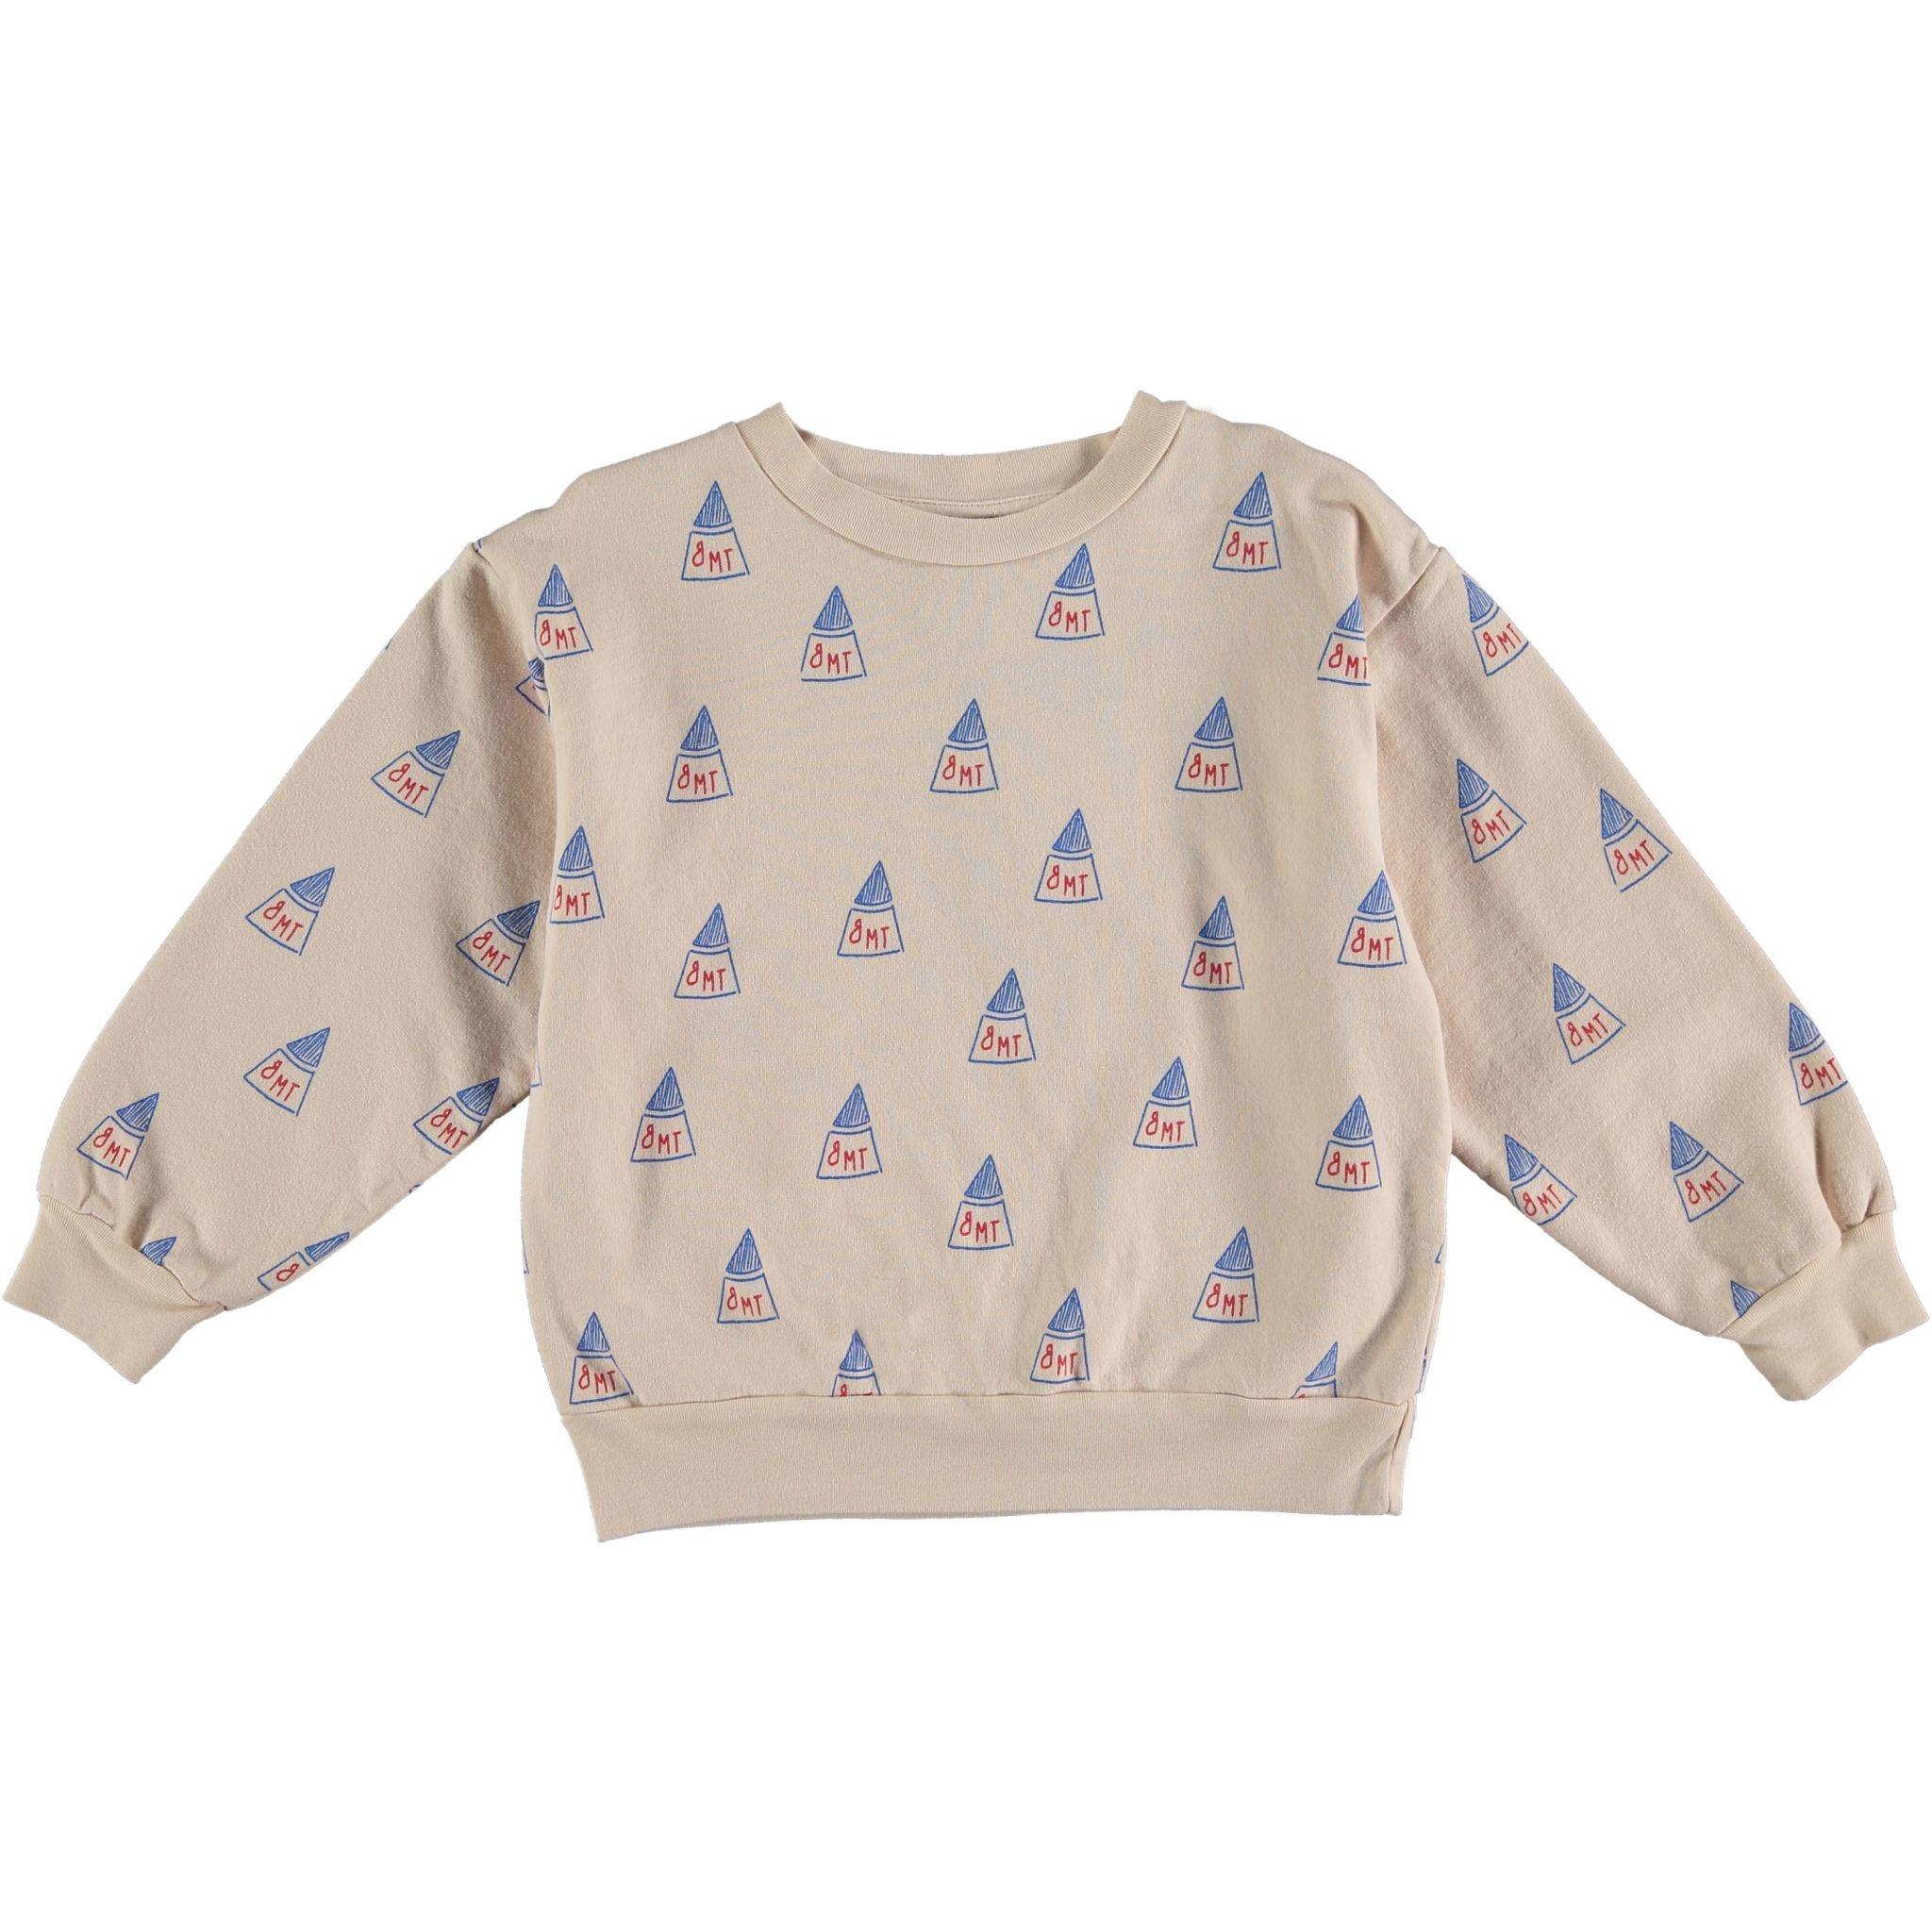 Sweatshirt all over bmt fog kids-1